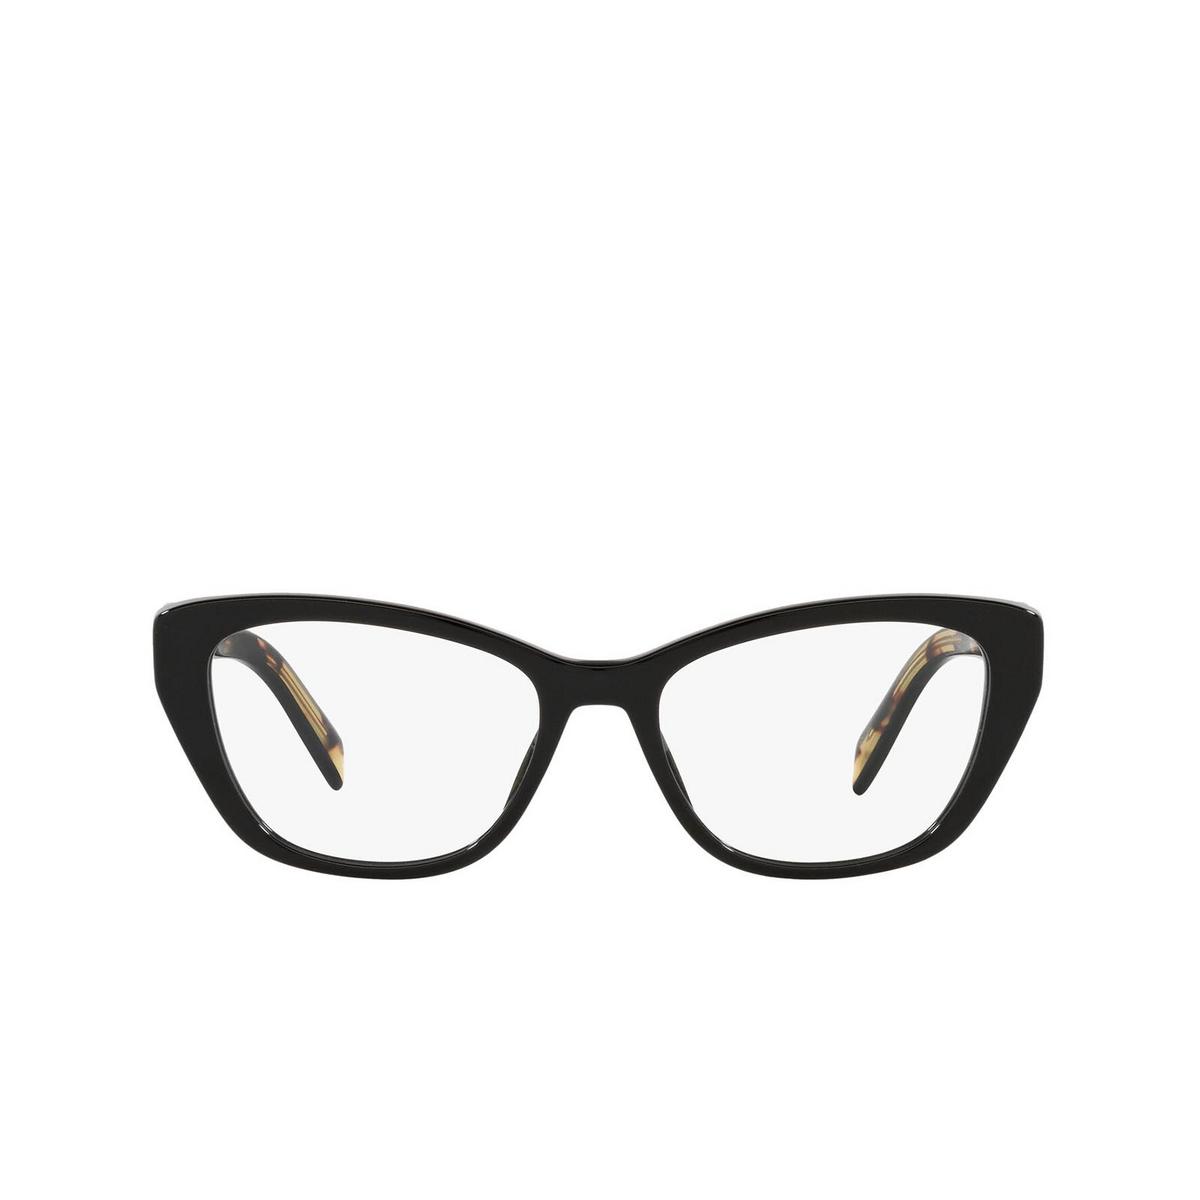 Prada® Cat-eye Eyeglasses: PR 19WV color Black 1AB1O1 - front view.